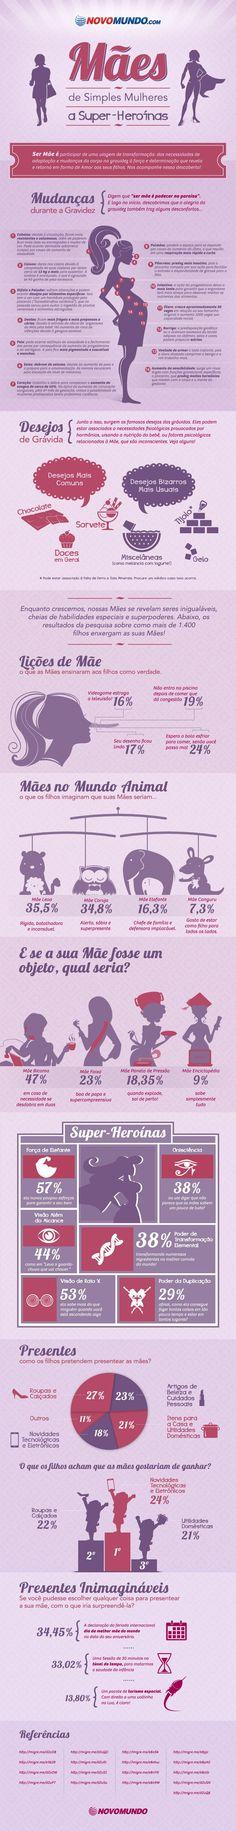 Mães – de Simples Mulheres a Super-Heroínas